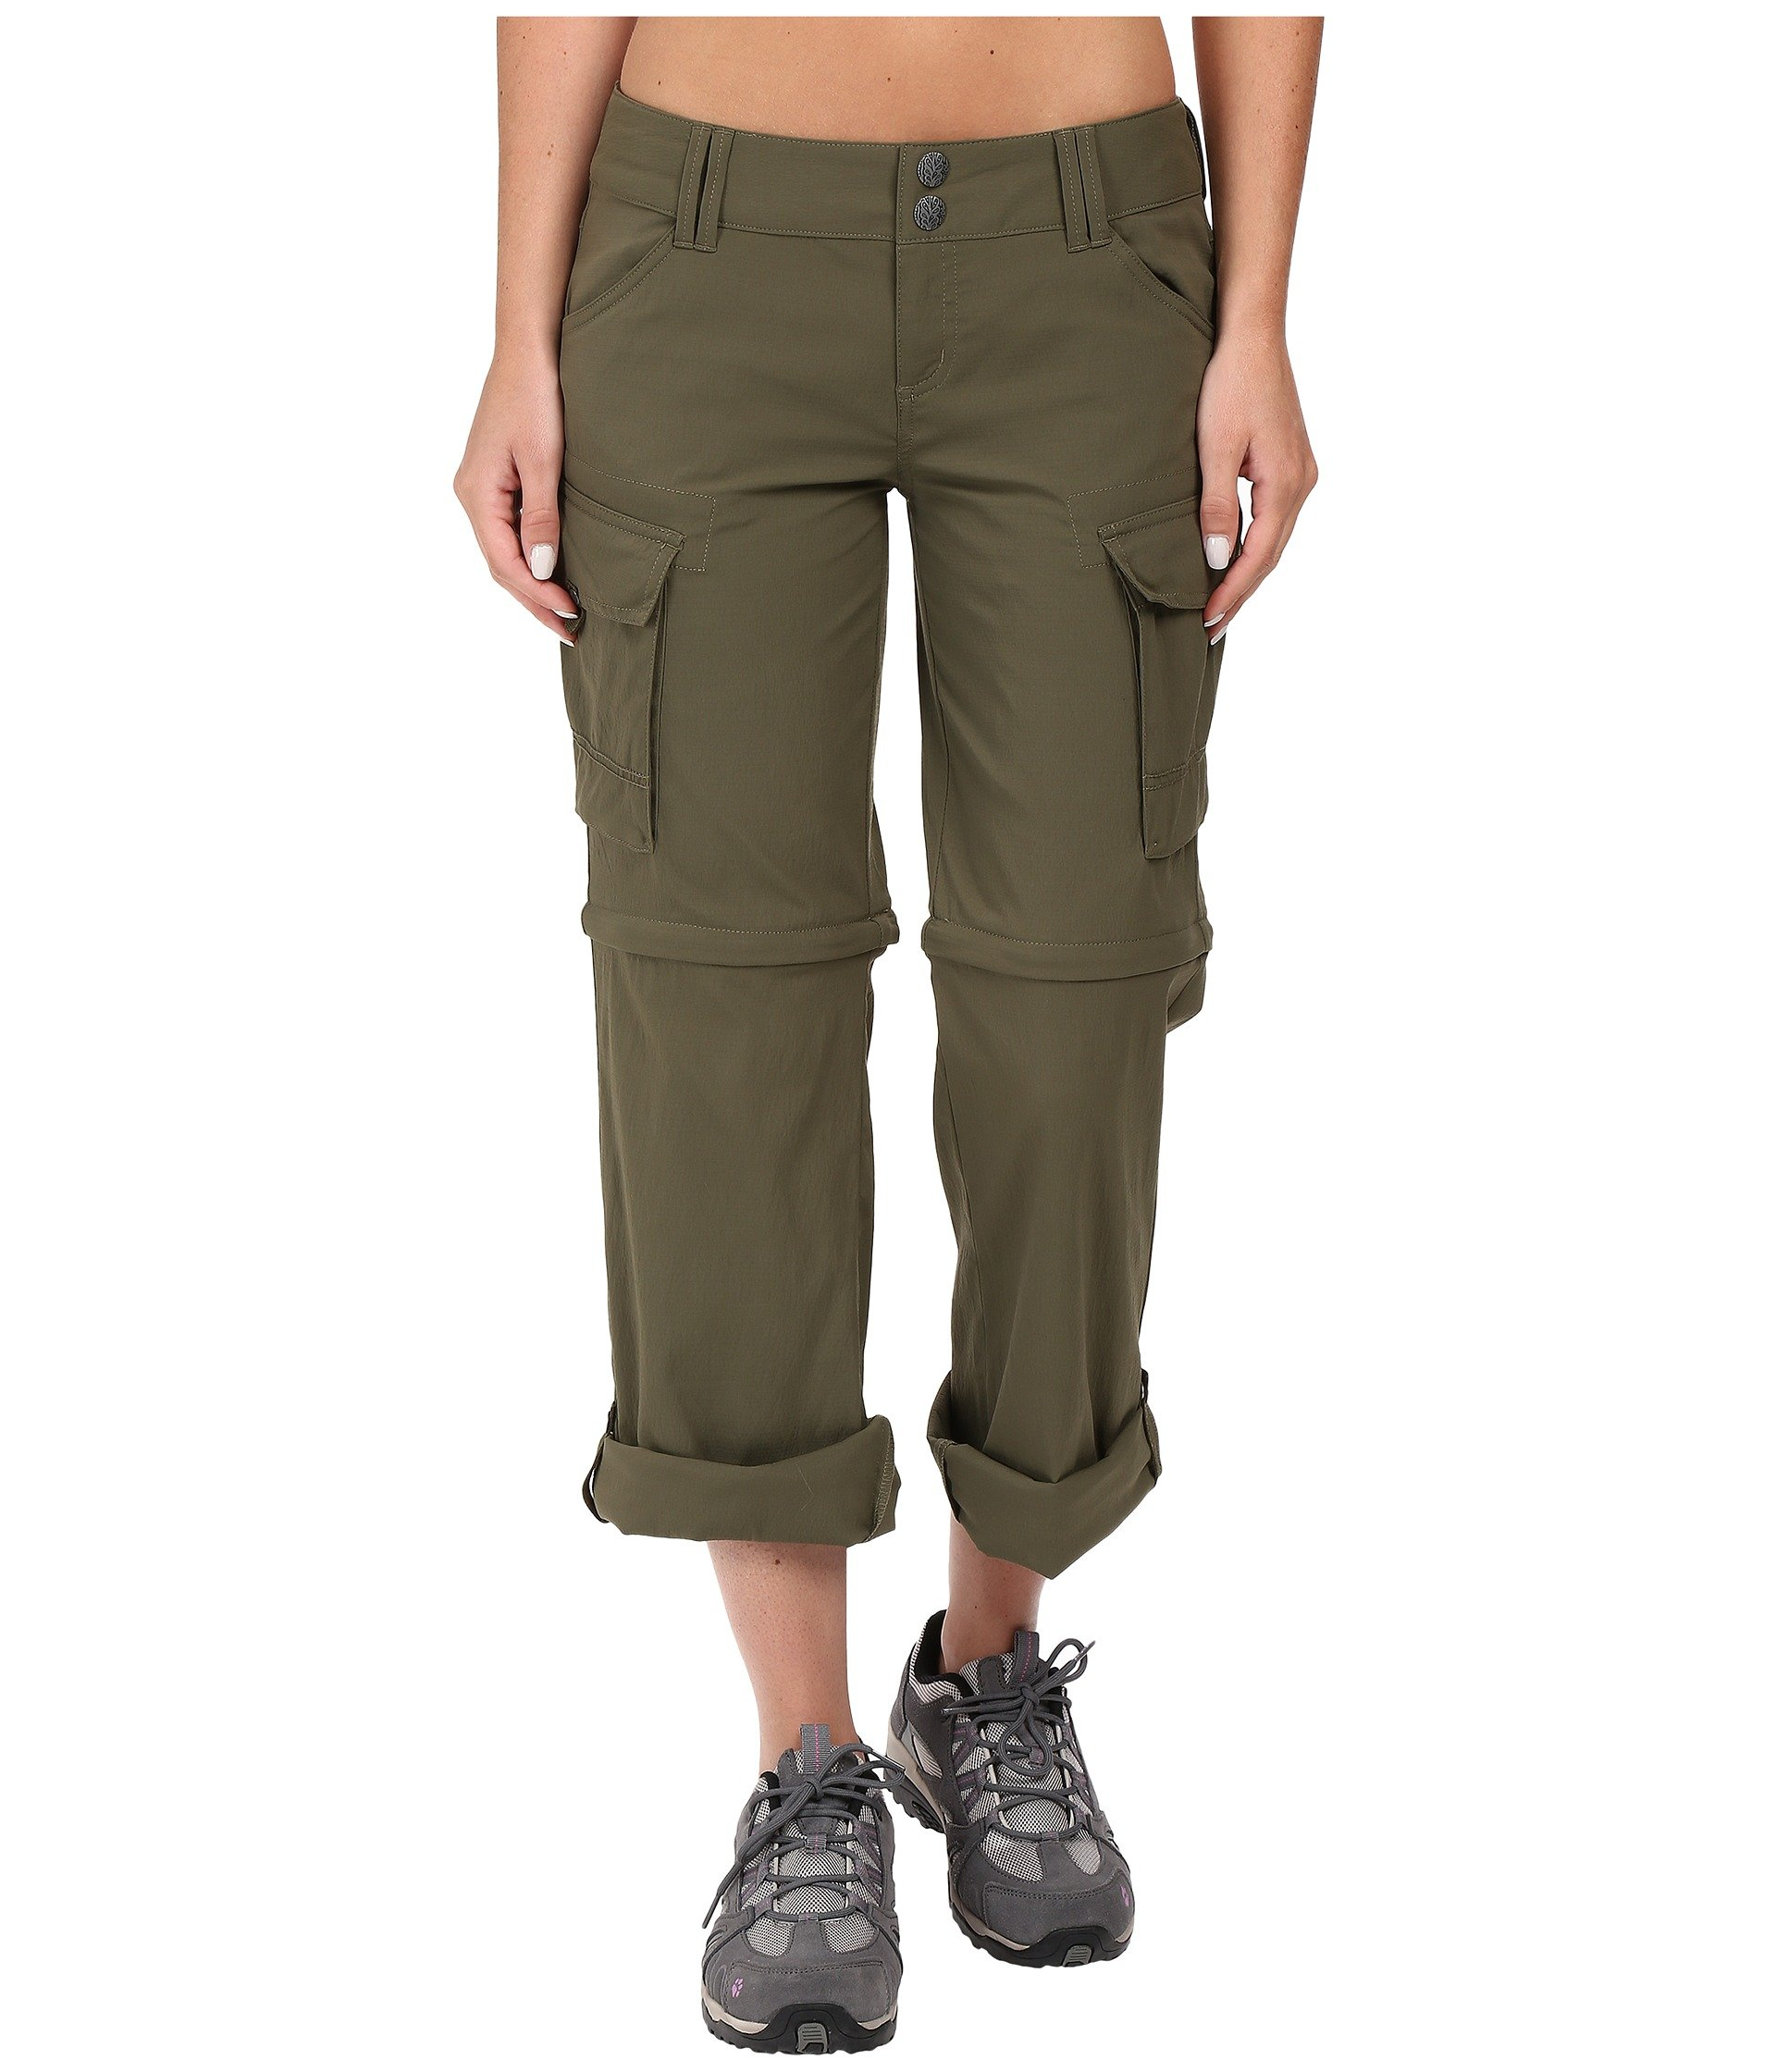 prana sage convertible pants how to fix zipper